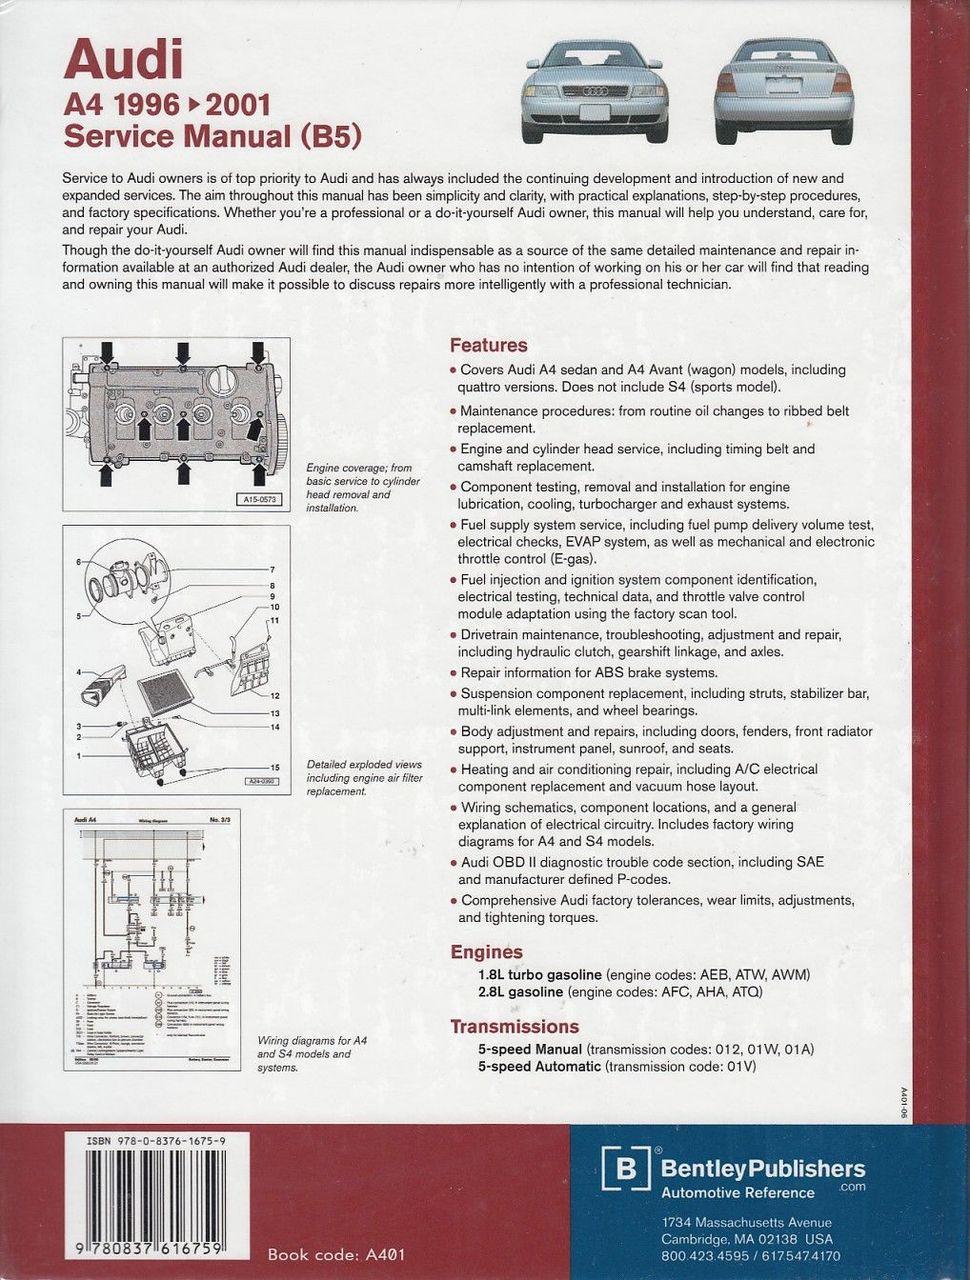 ... Audi A4 1996 - 2001 Workshop Manual Back Cover